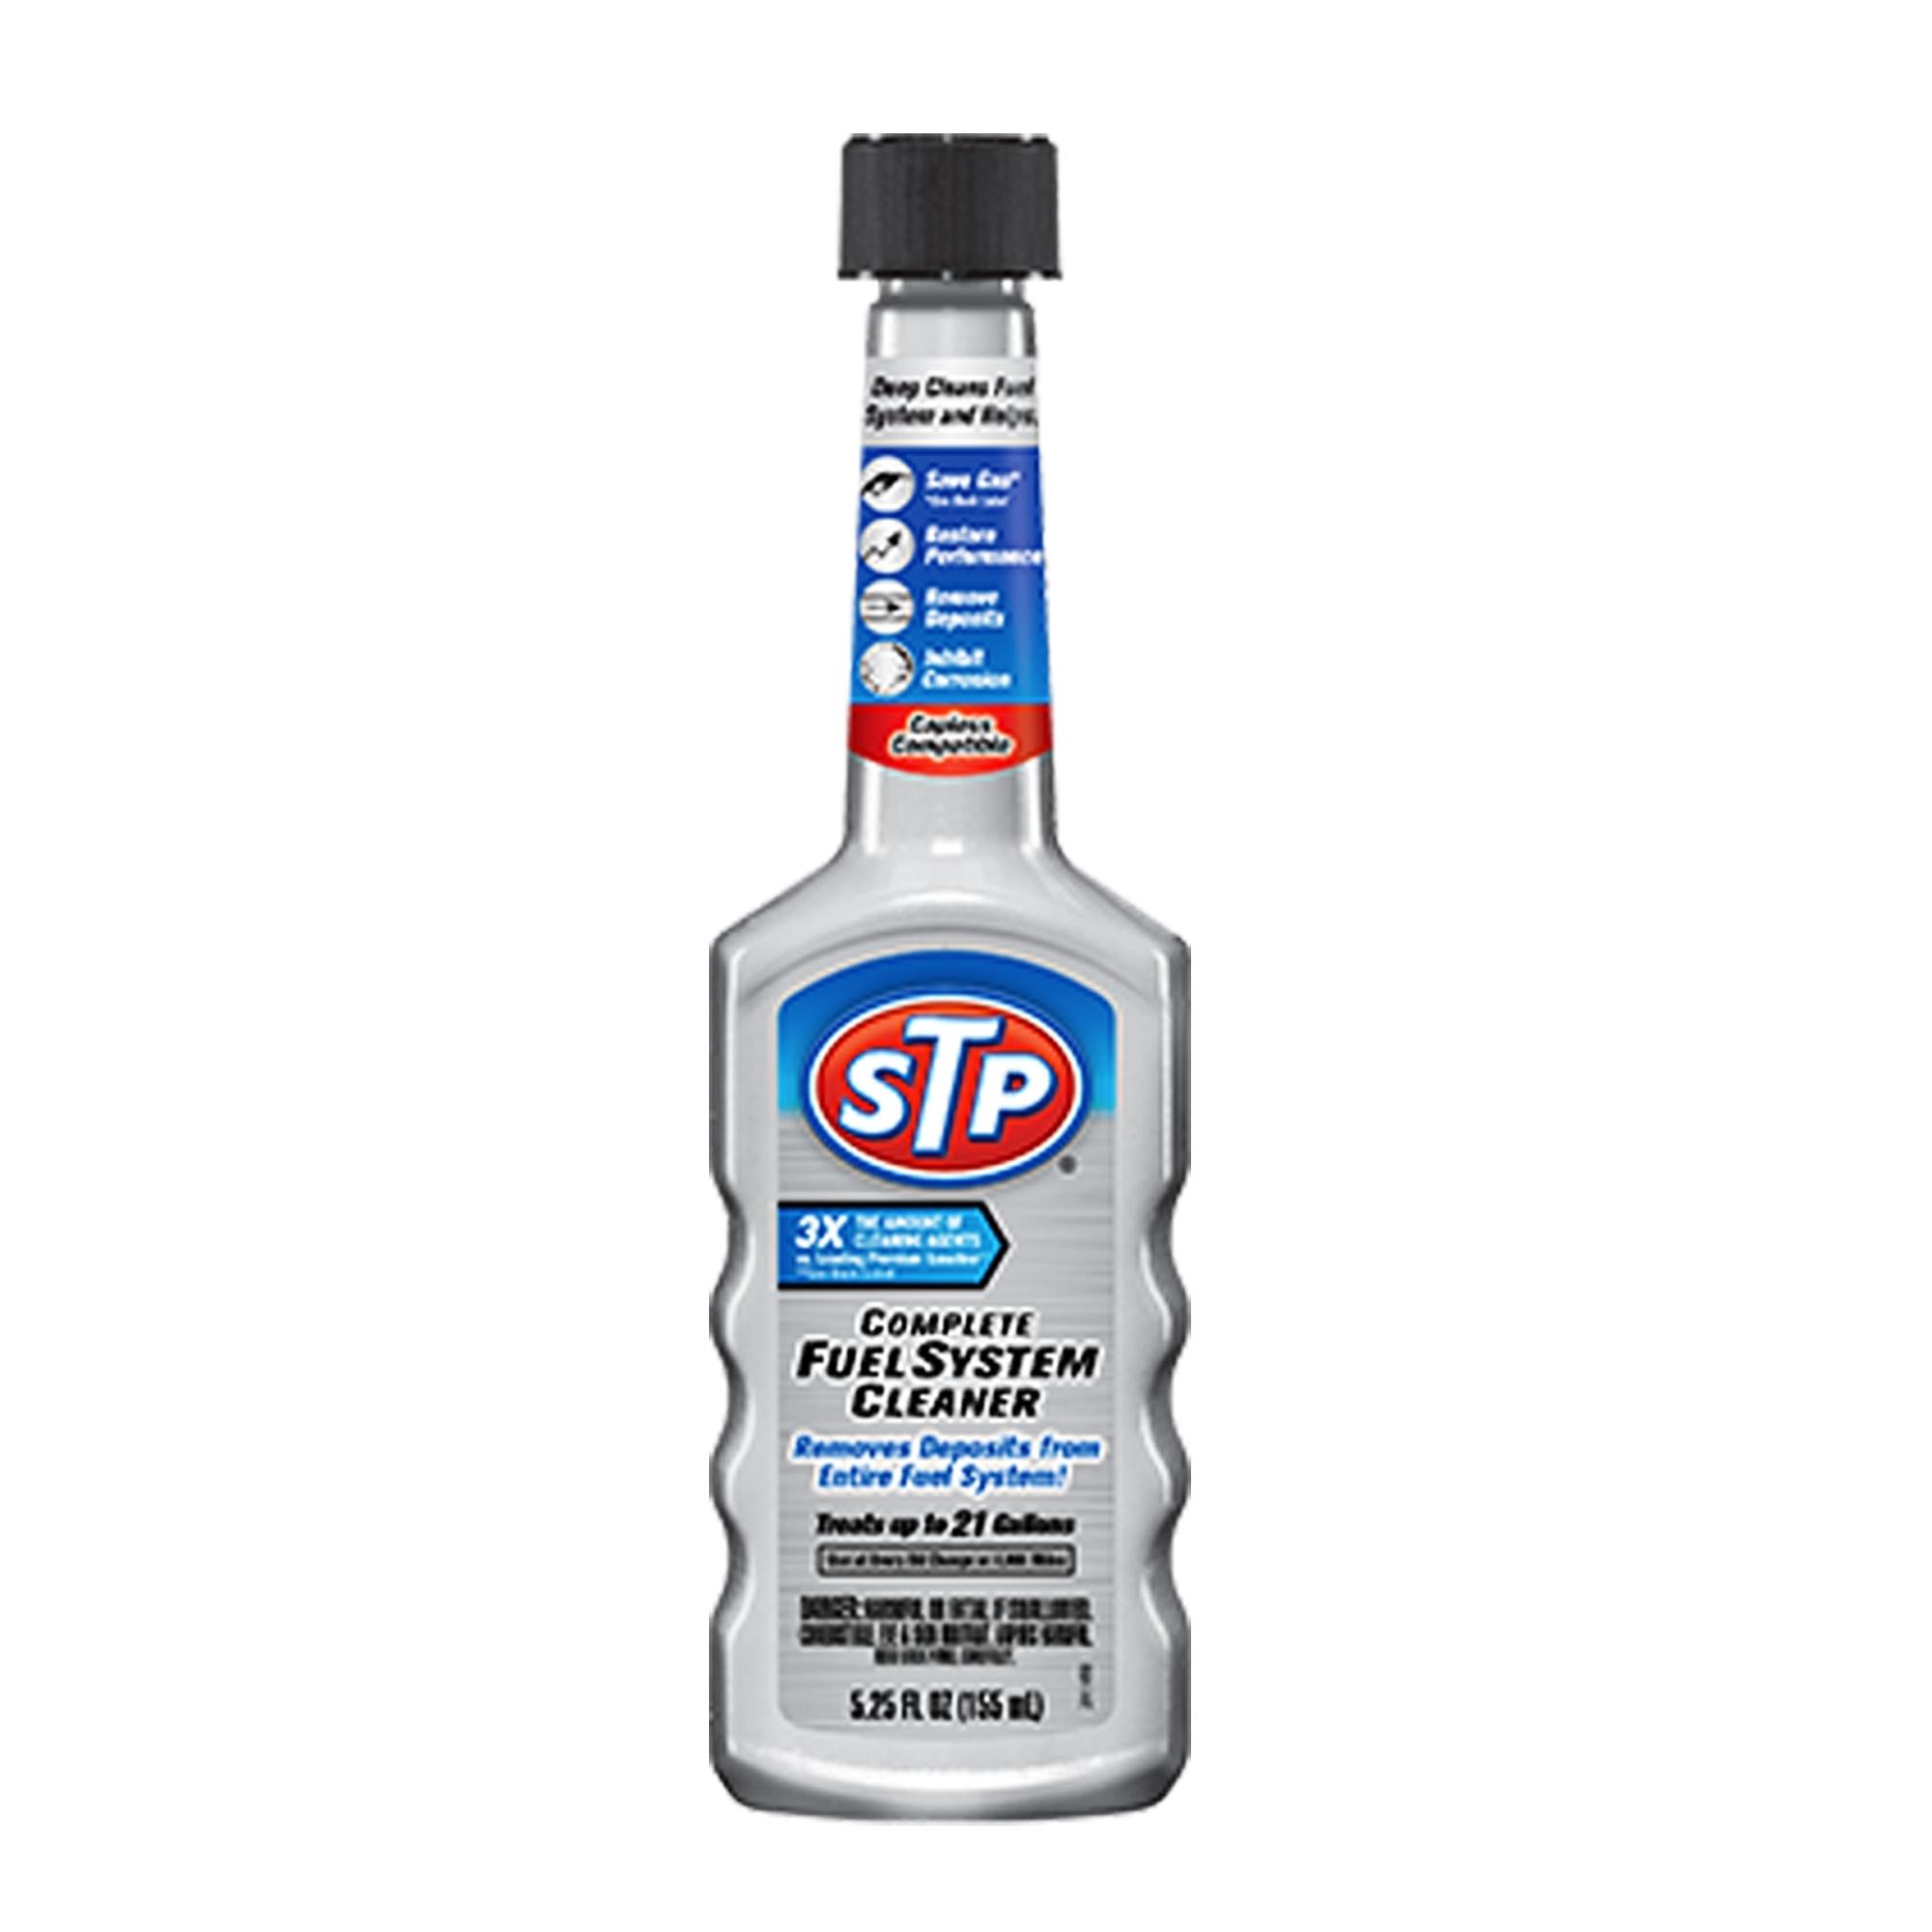 STP Complete Fuel System Cleaner น้ำยาล้างระบบเชื้อเพลิงเบนซิน